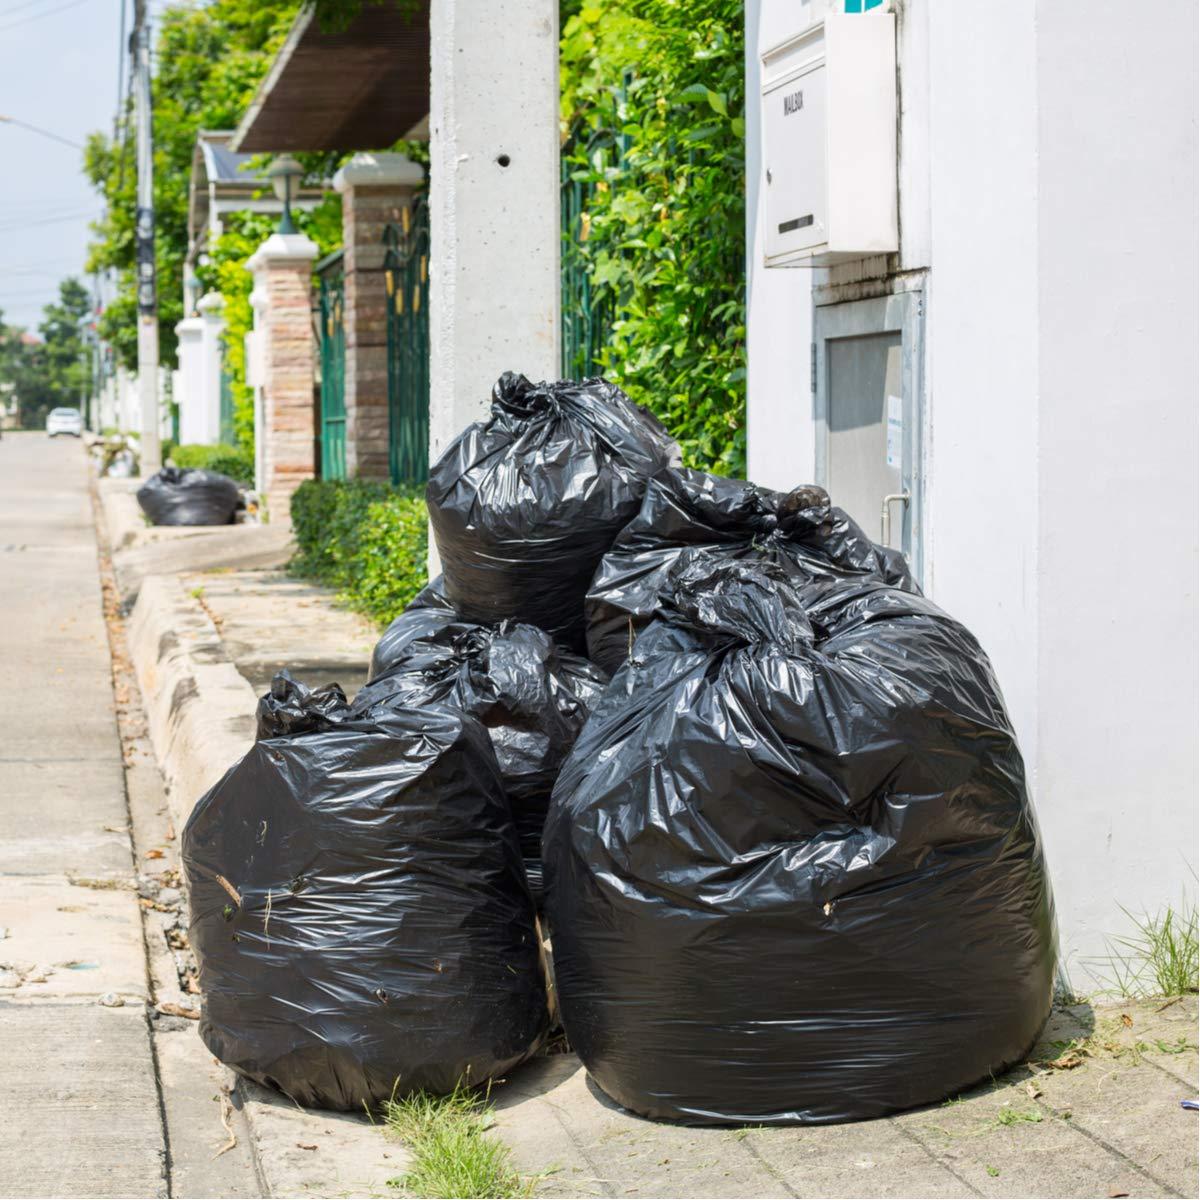 Toughbag 95 Gal Trash bags, Black, 2 Mil, 61x68, 25 Garbage Bags Per Case by ToughBag (Image #8)